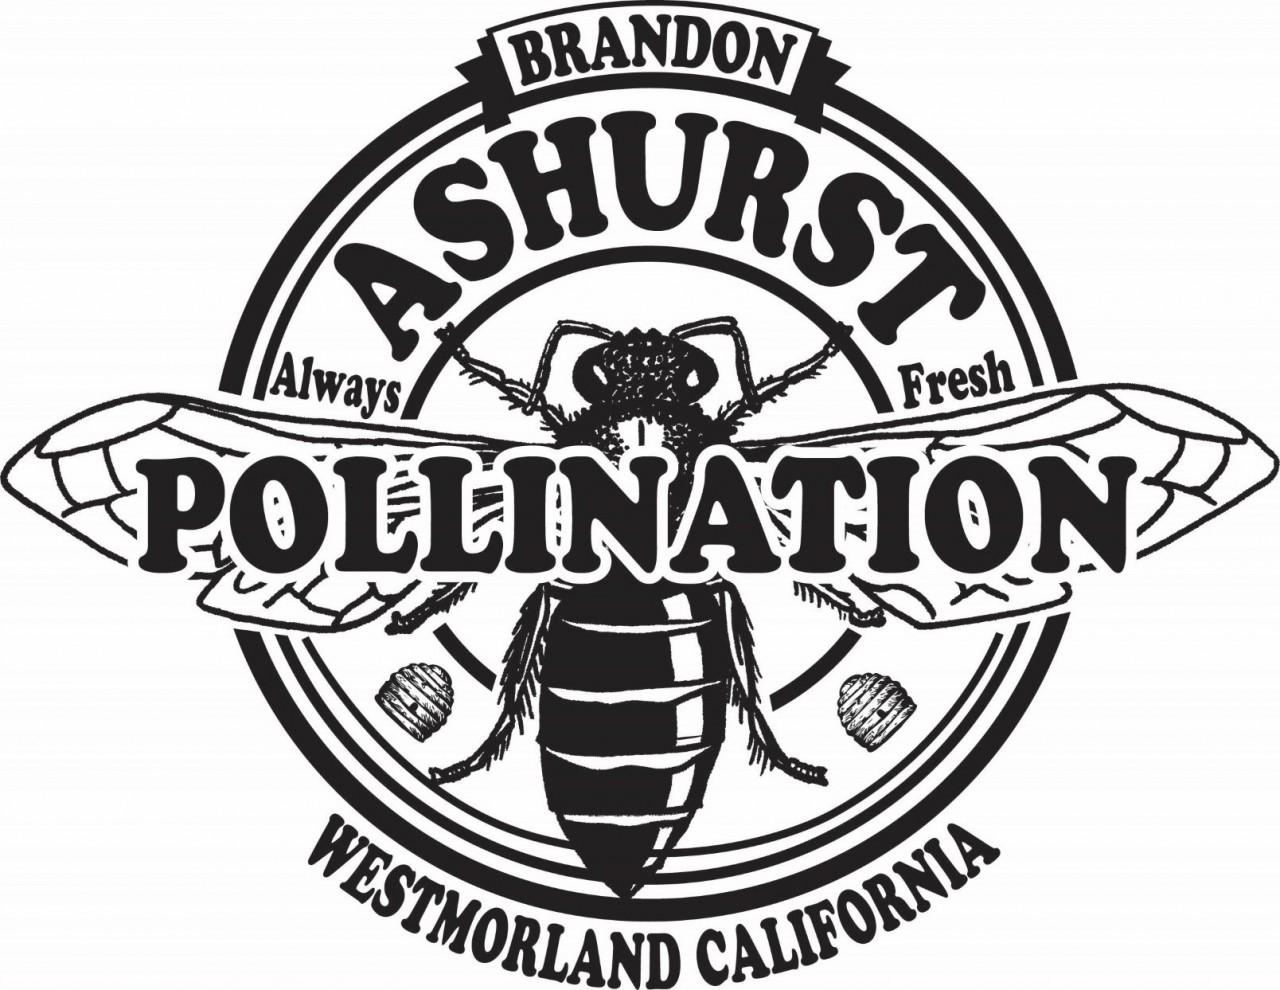 Ashurst Pollination